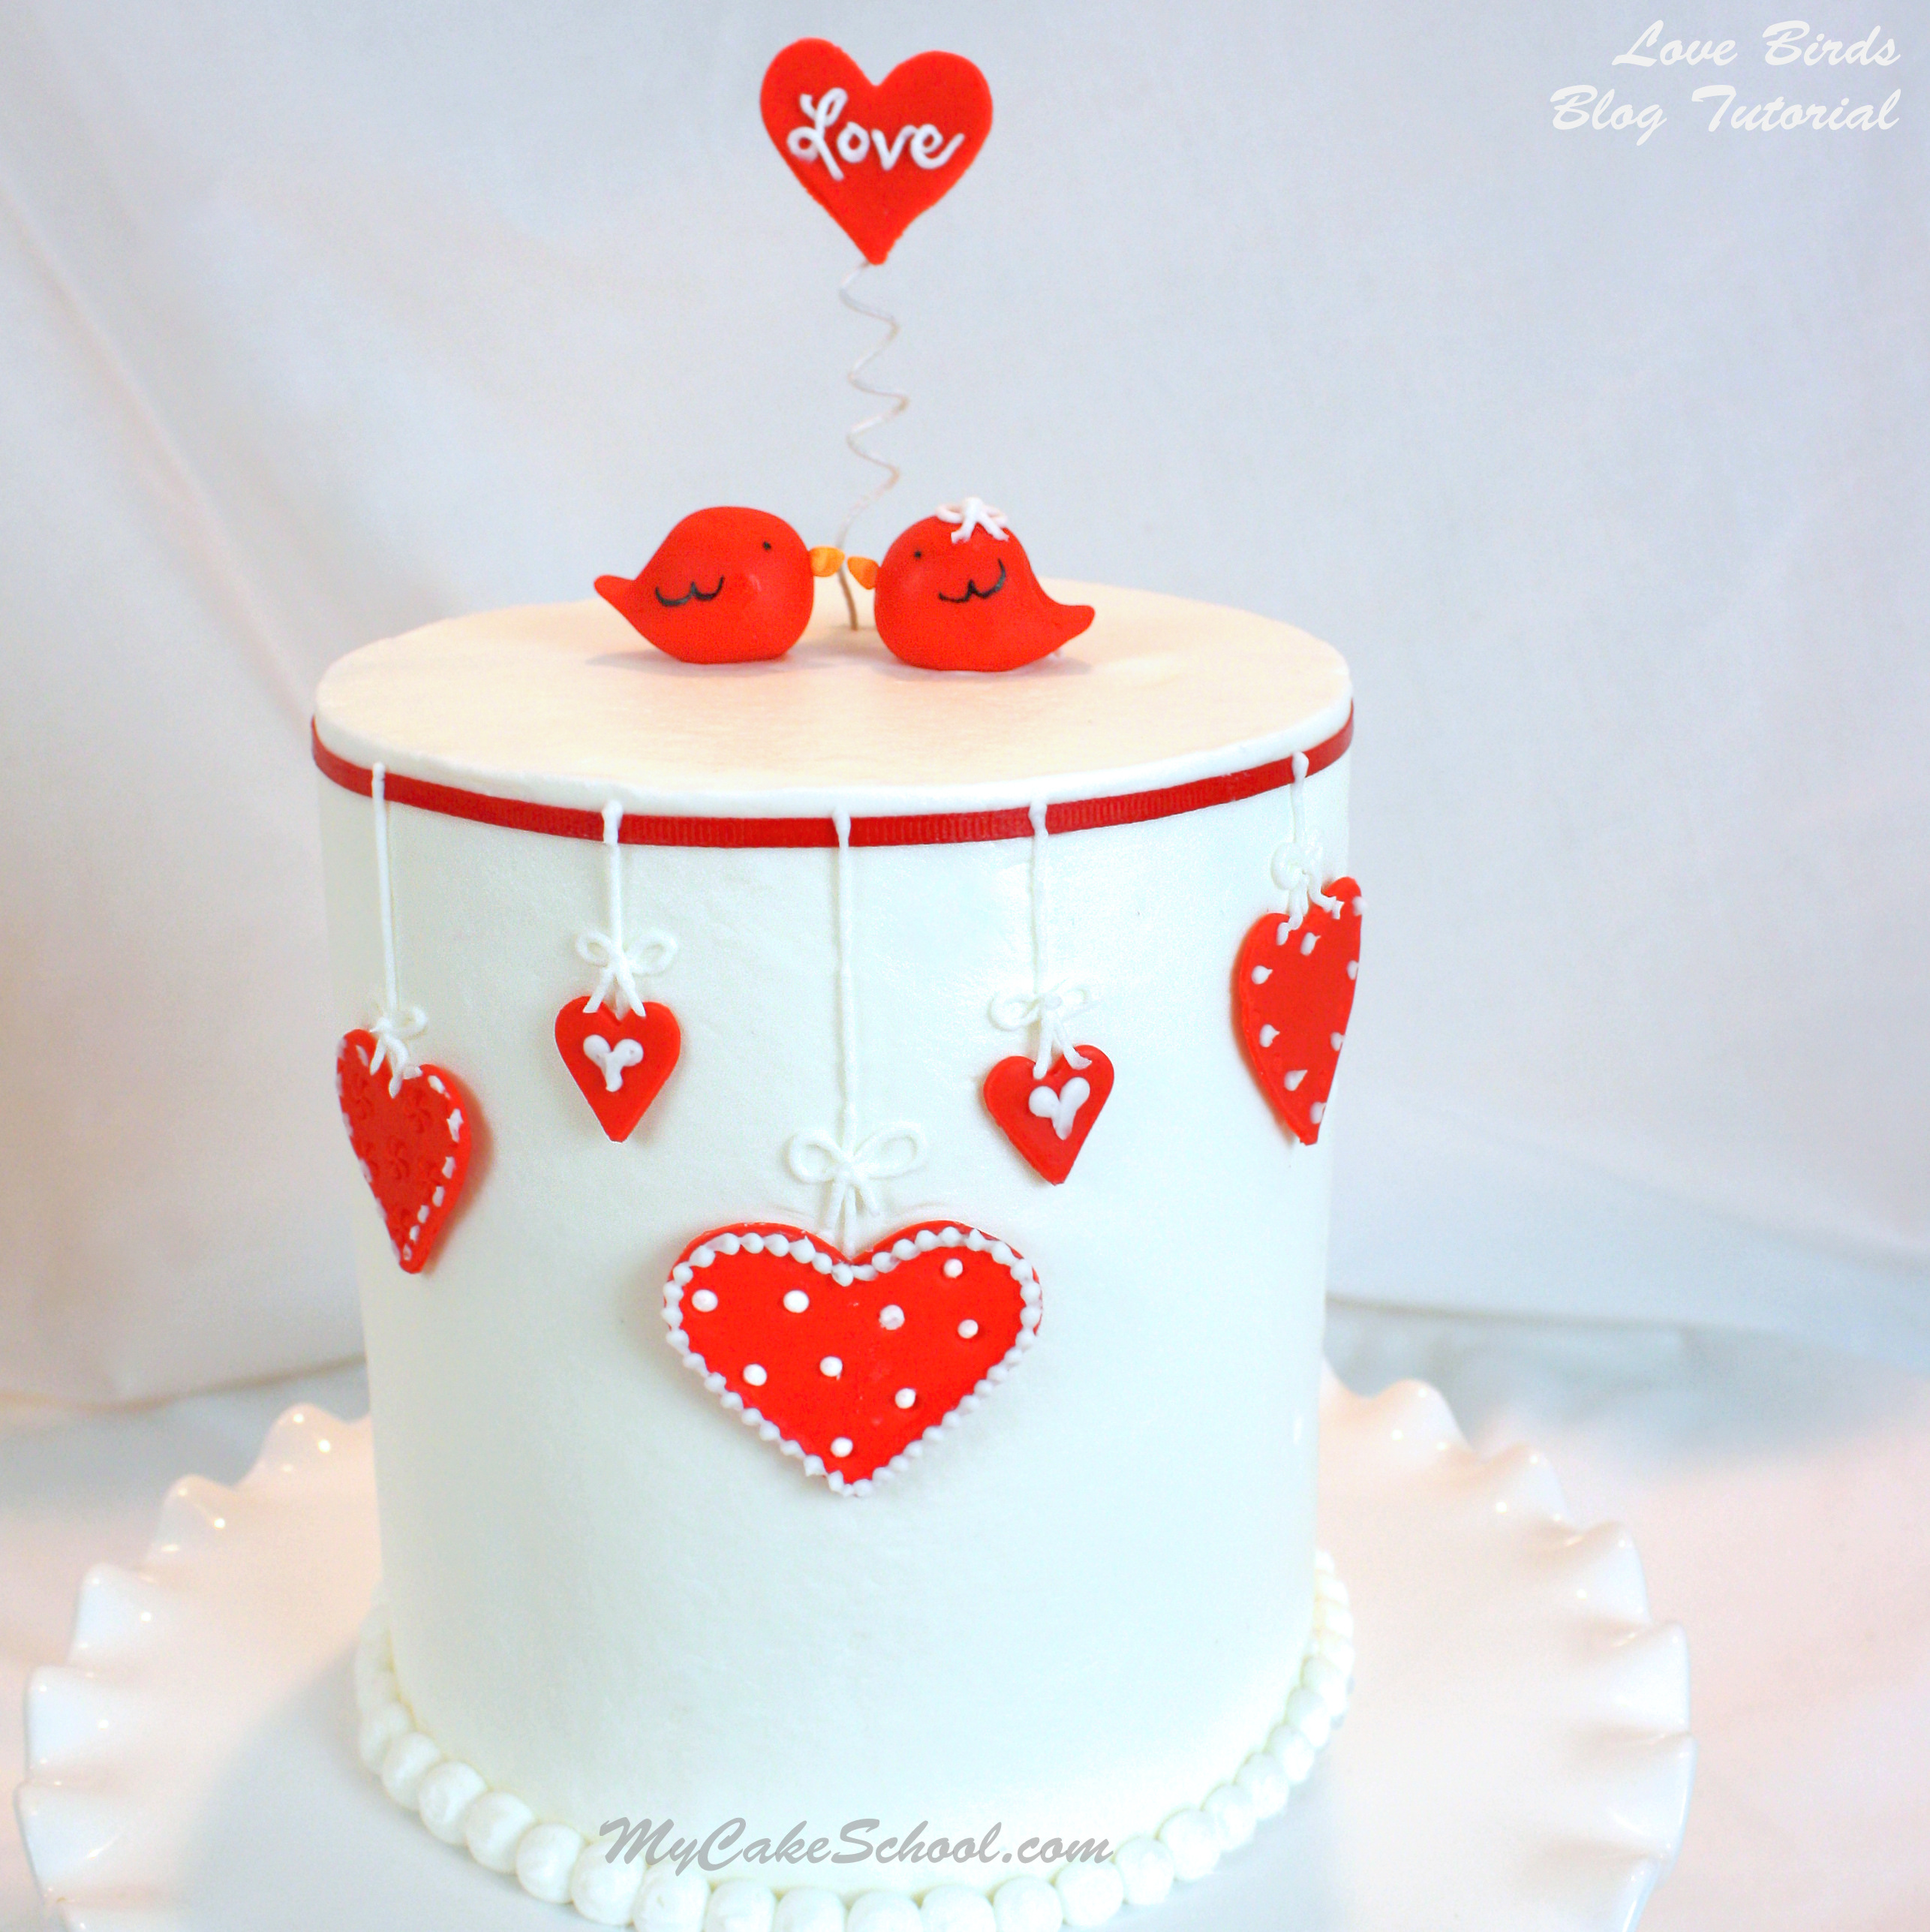 Valentine's Love Birds Cake